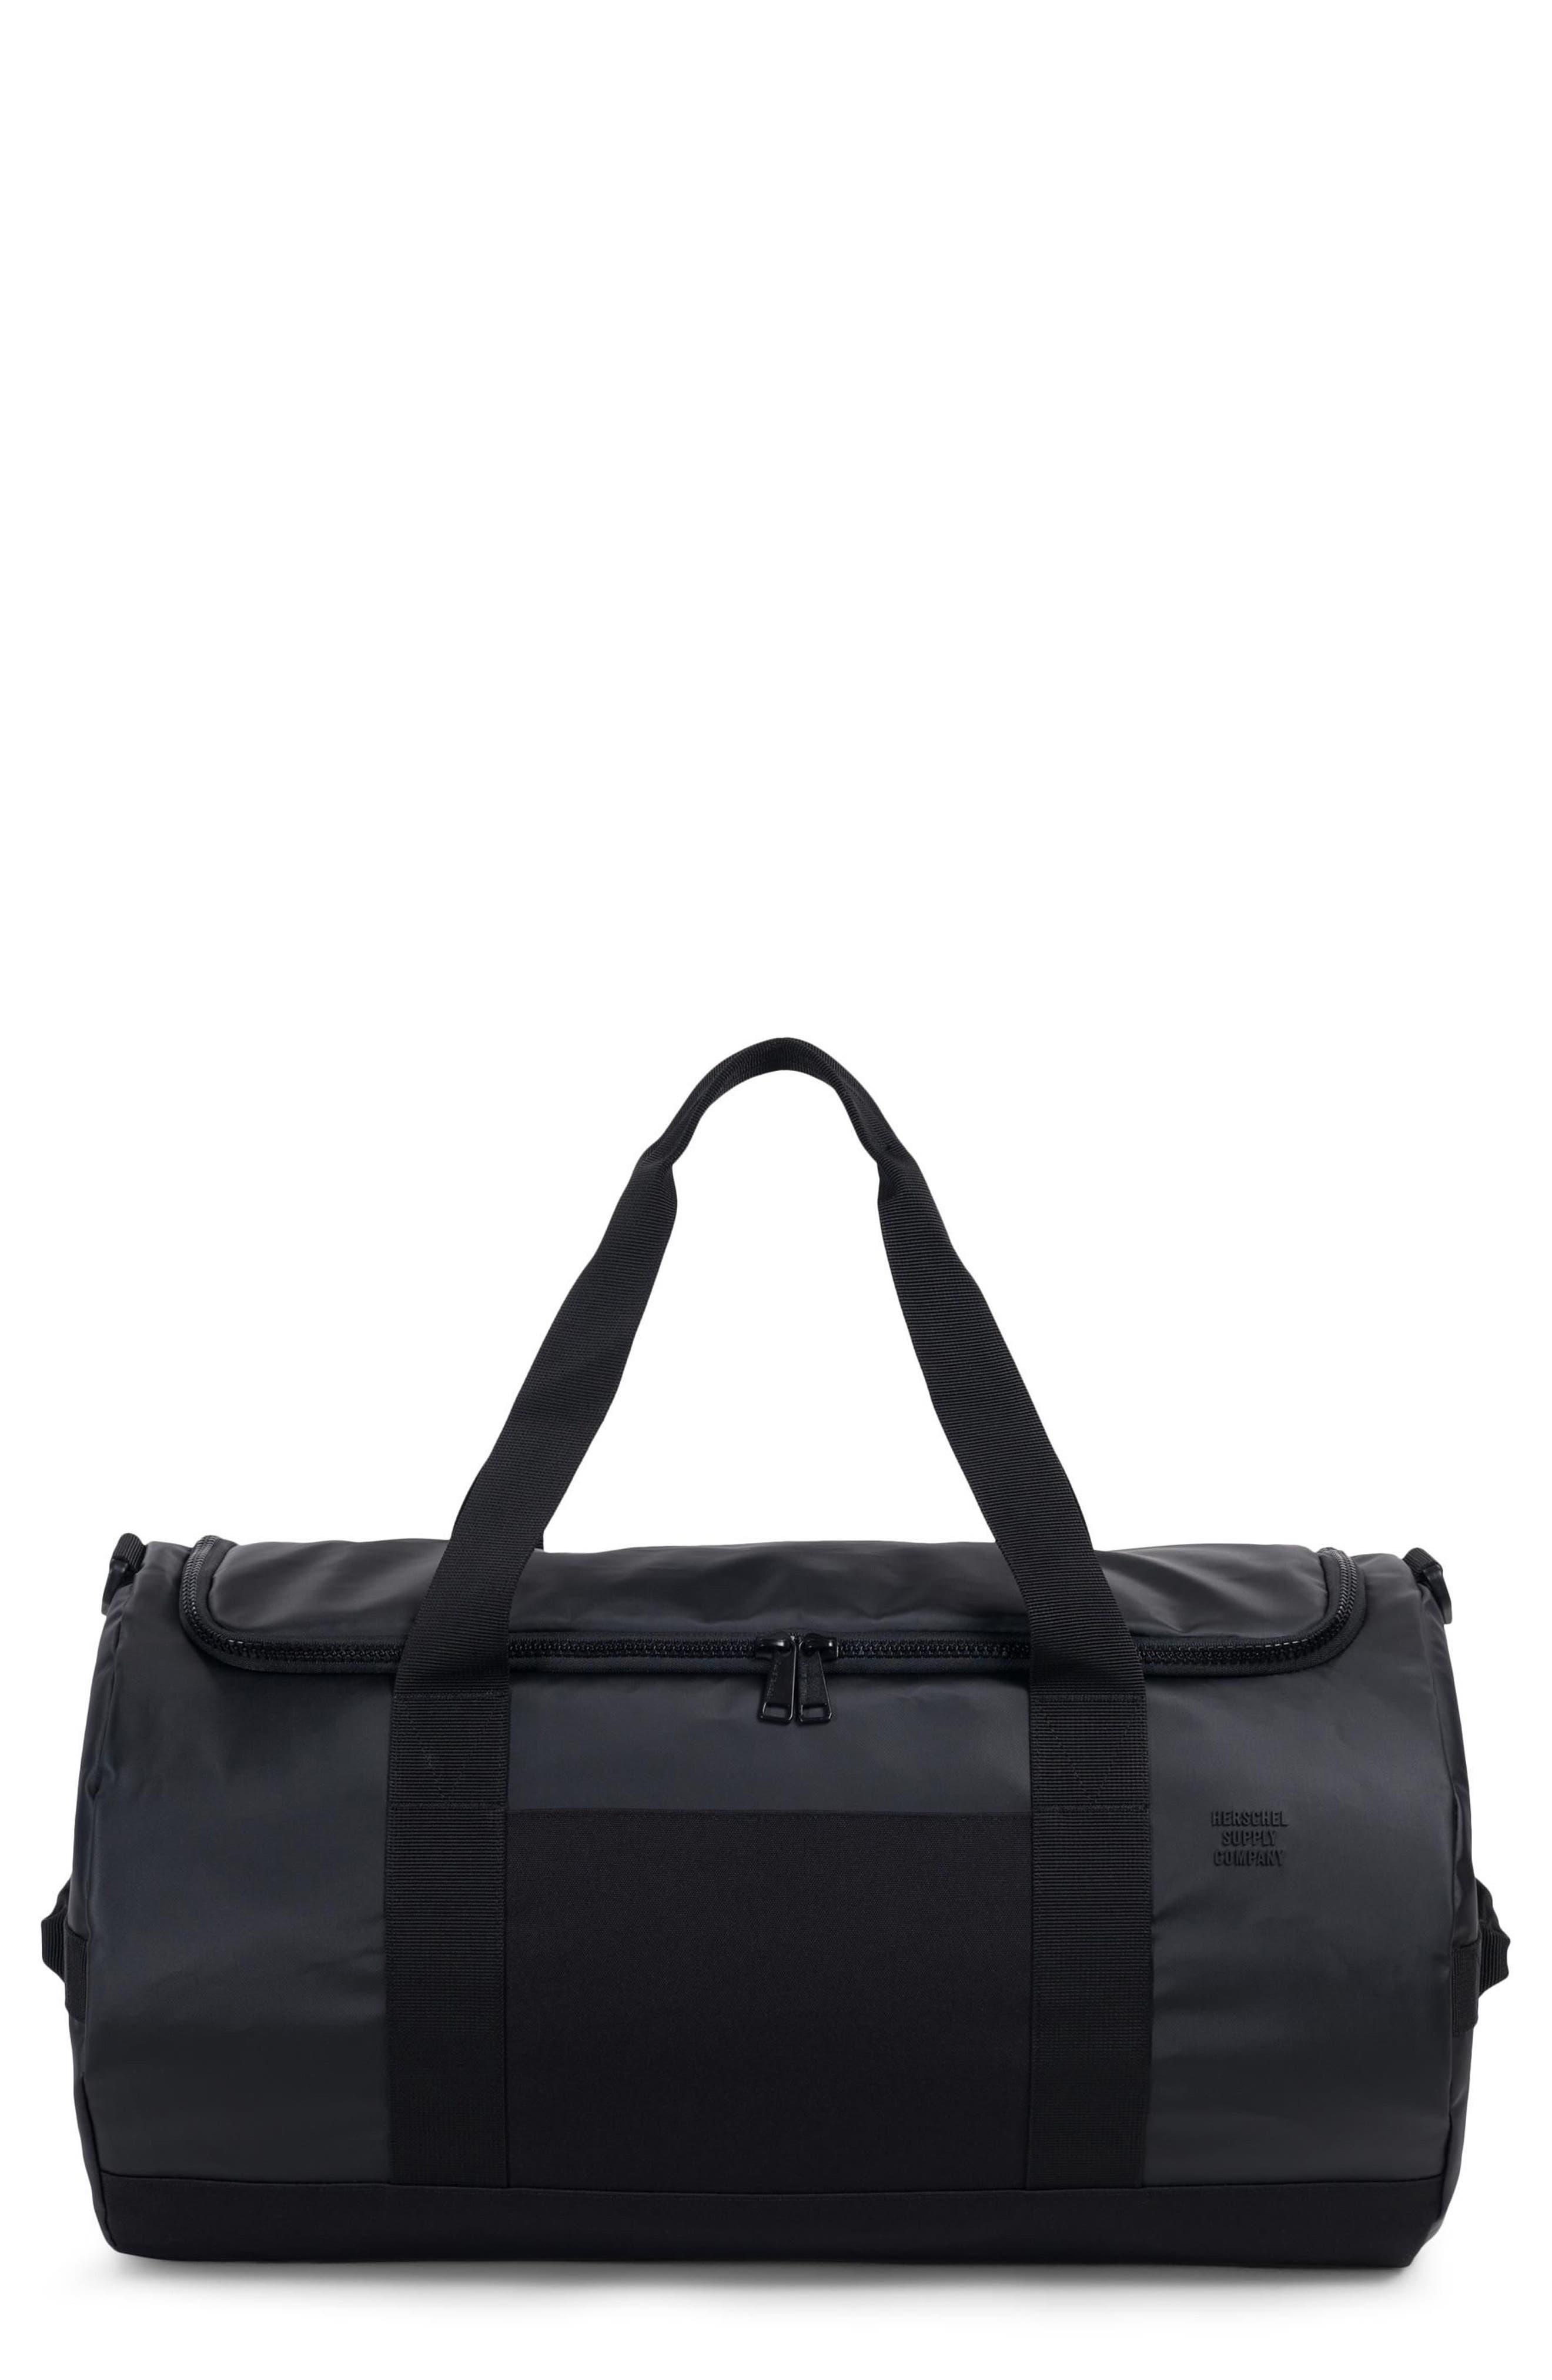 Herschel Supply Co. Sutton Polycoat Studio Duffel Bag